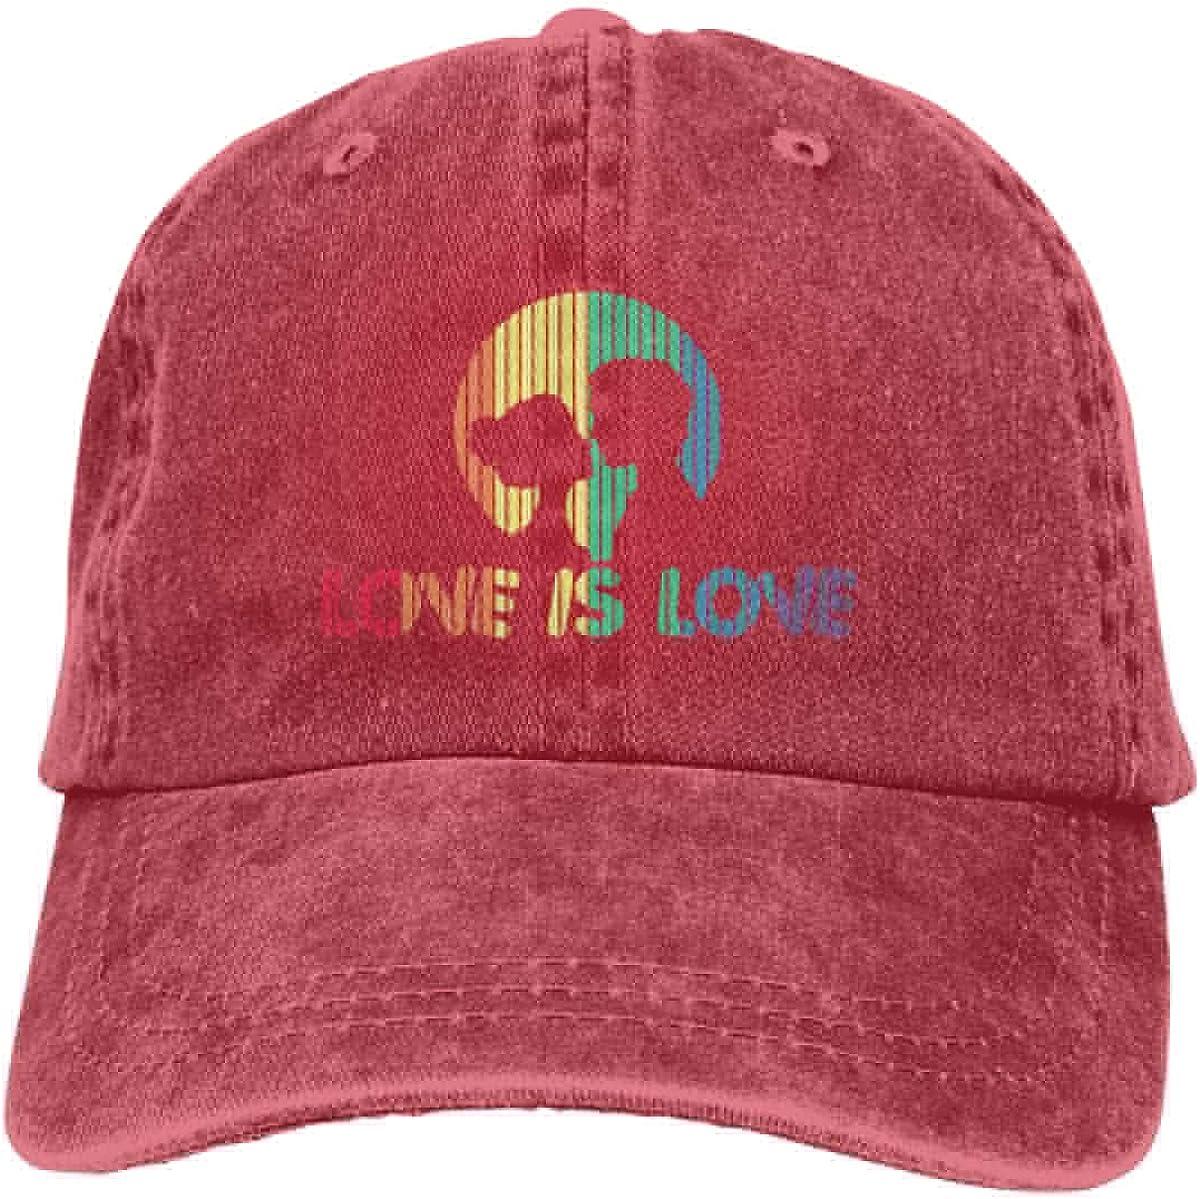 Adorable Love Unisex Trendy Jeans Sun Hat Adjustable Baseball Cap